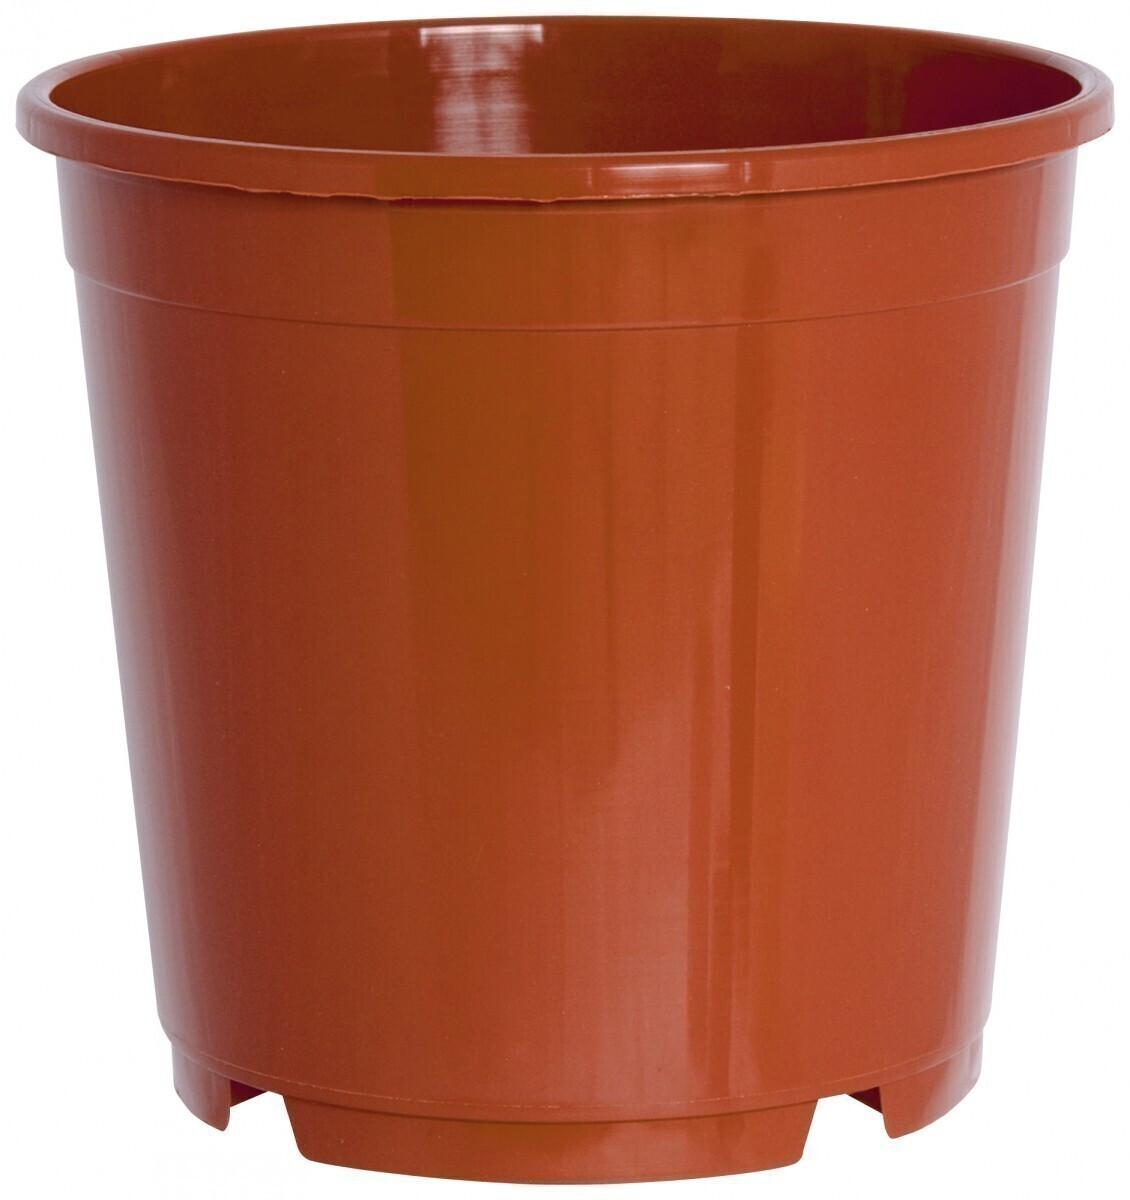 geli Containertopf 10er Set Ø30cm